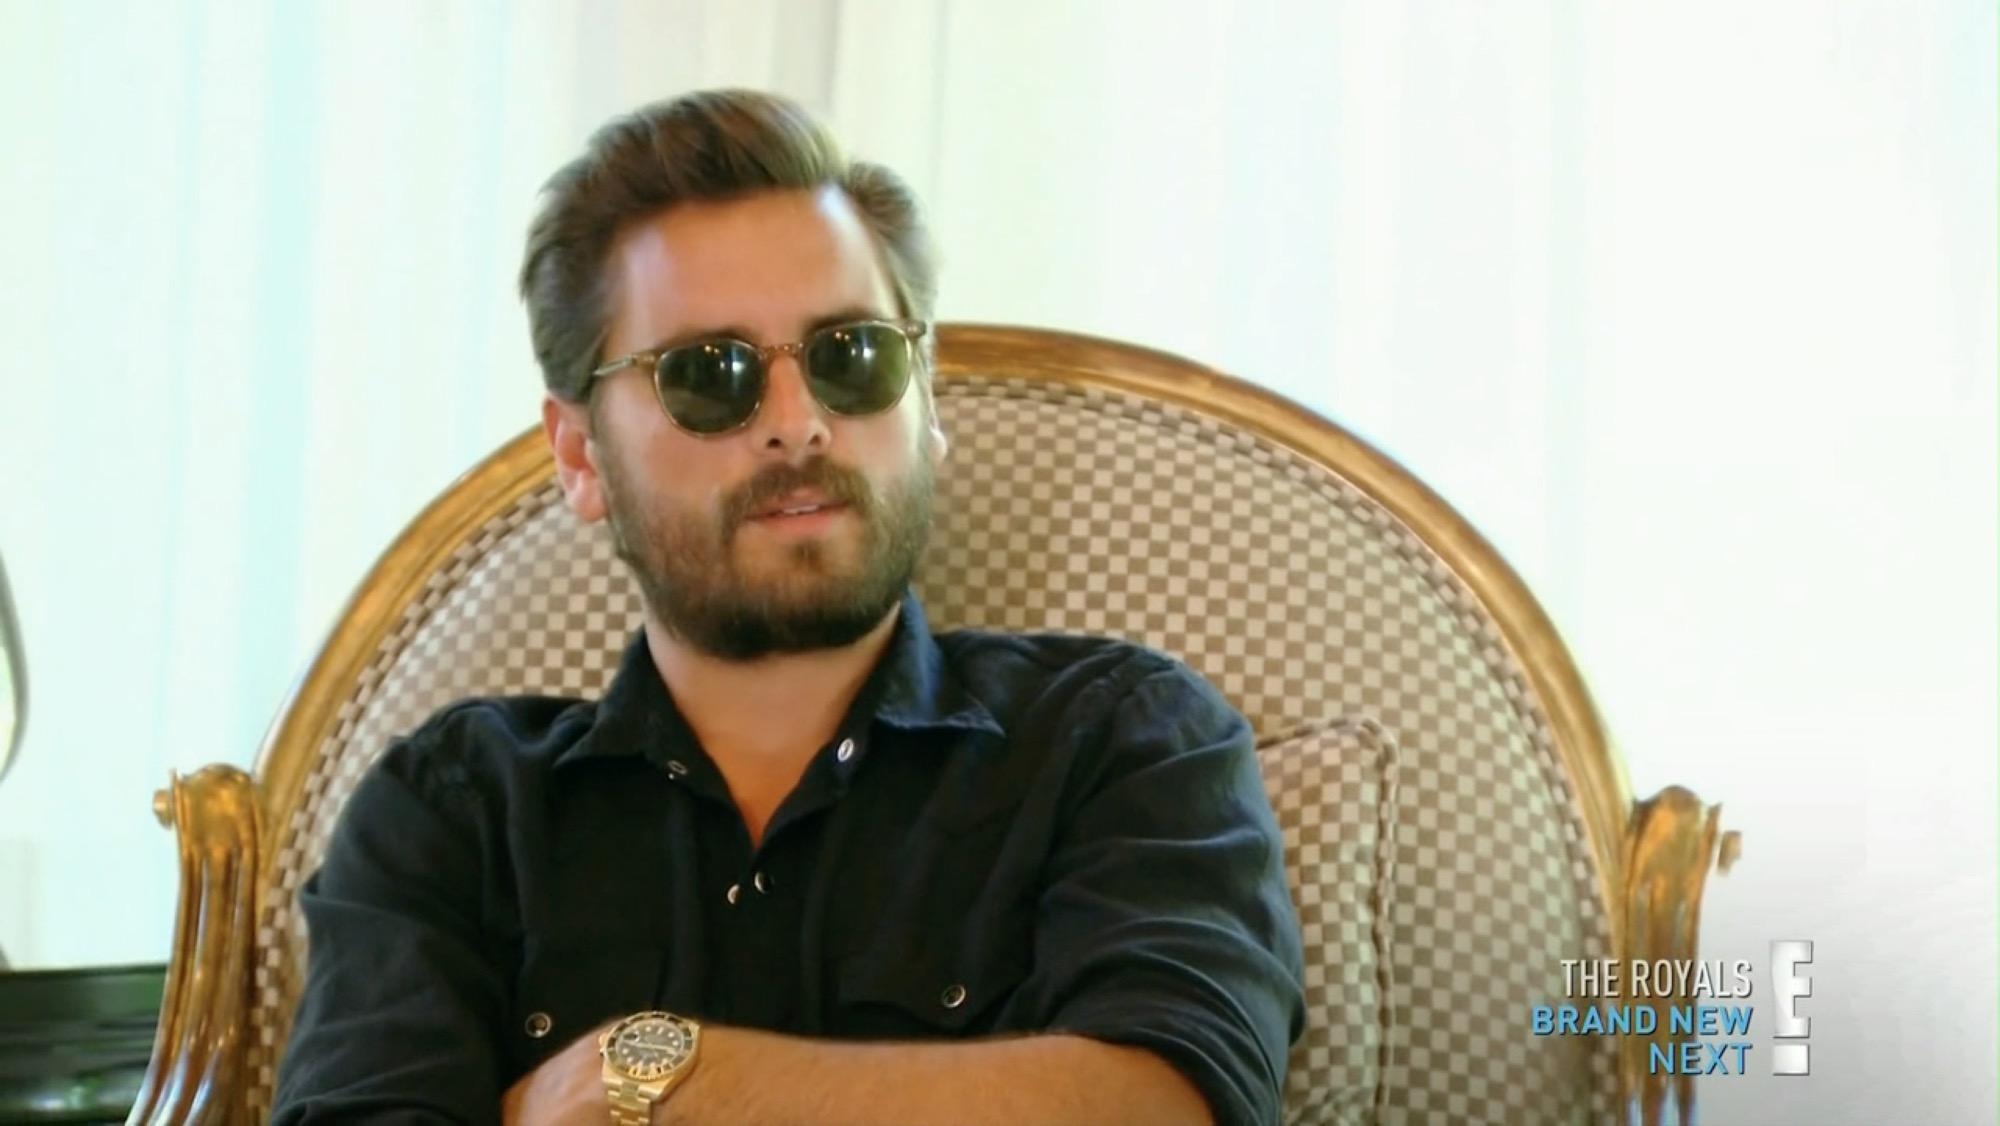 Scott Disick Sunglasses  scott disick s beige garrett leight wellesley sunglasses from